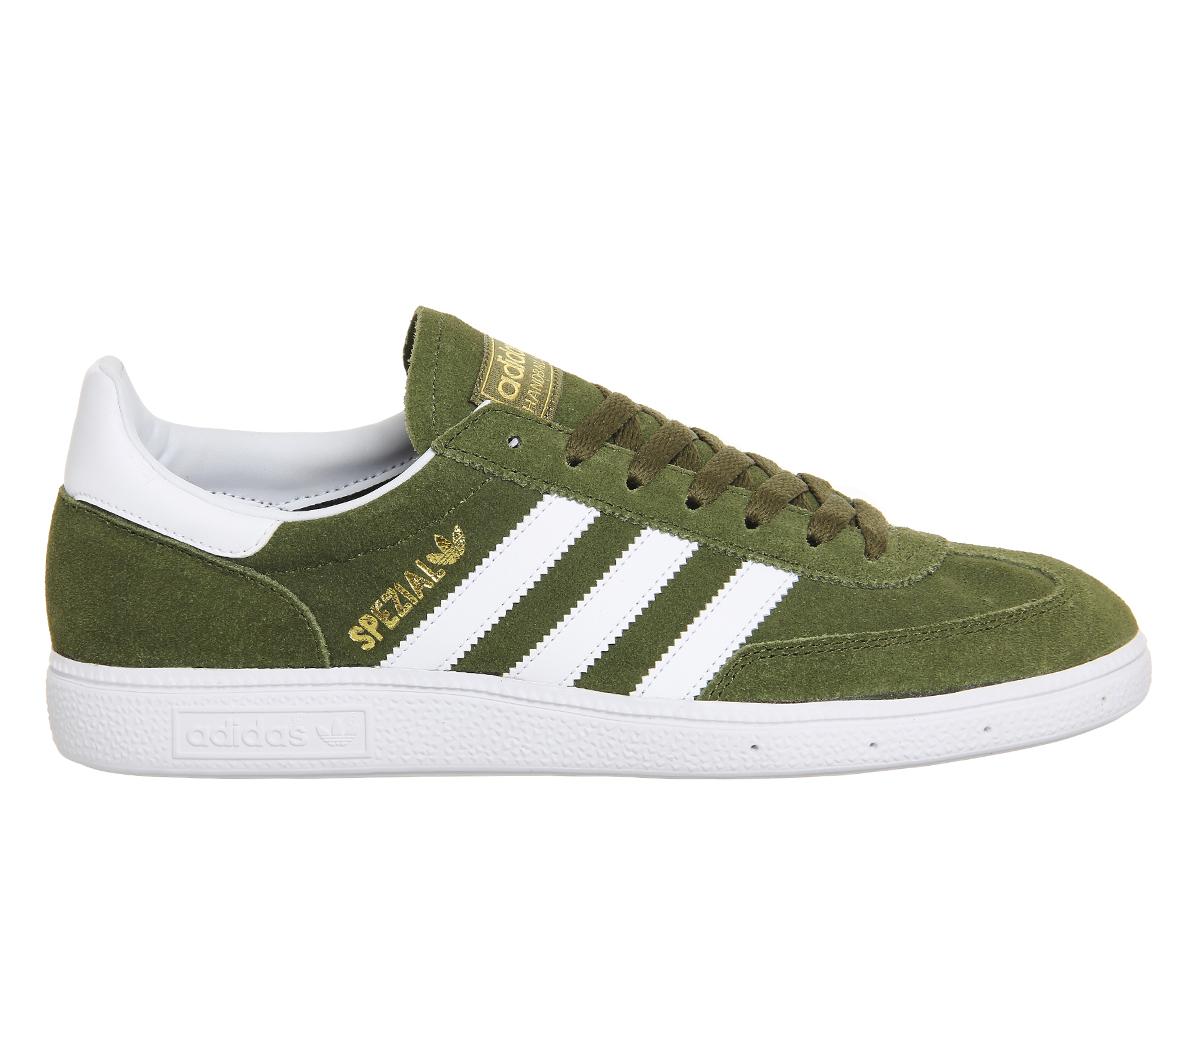 nike air max cuir homme - adidas-green-spezial-product-6-583268875-normal.jpeg